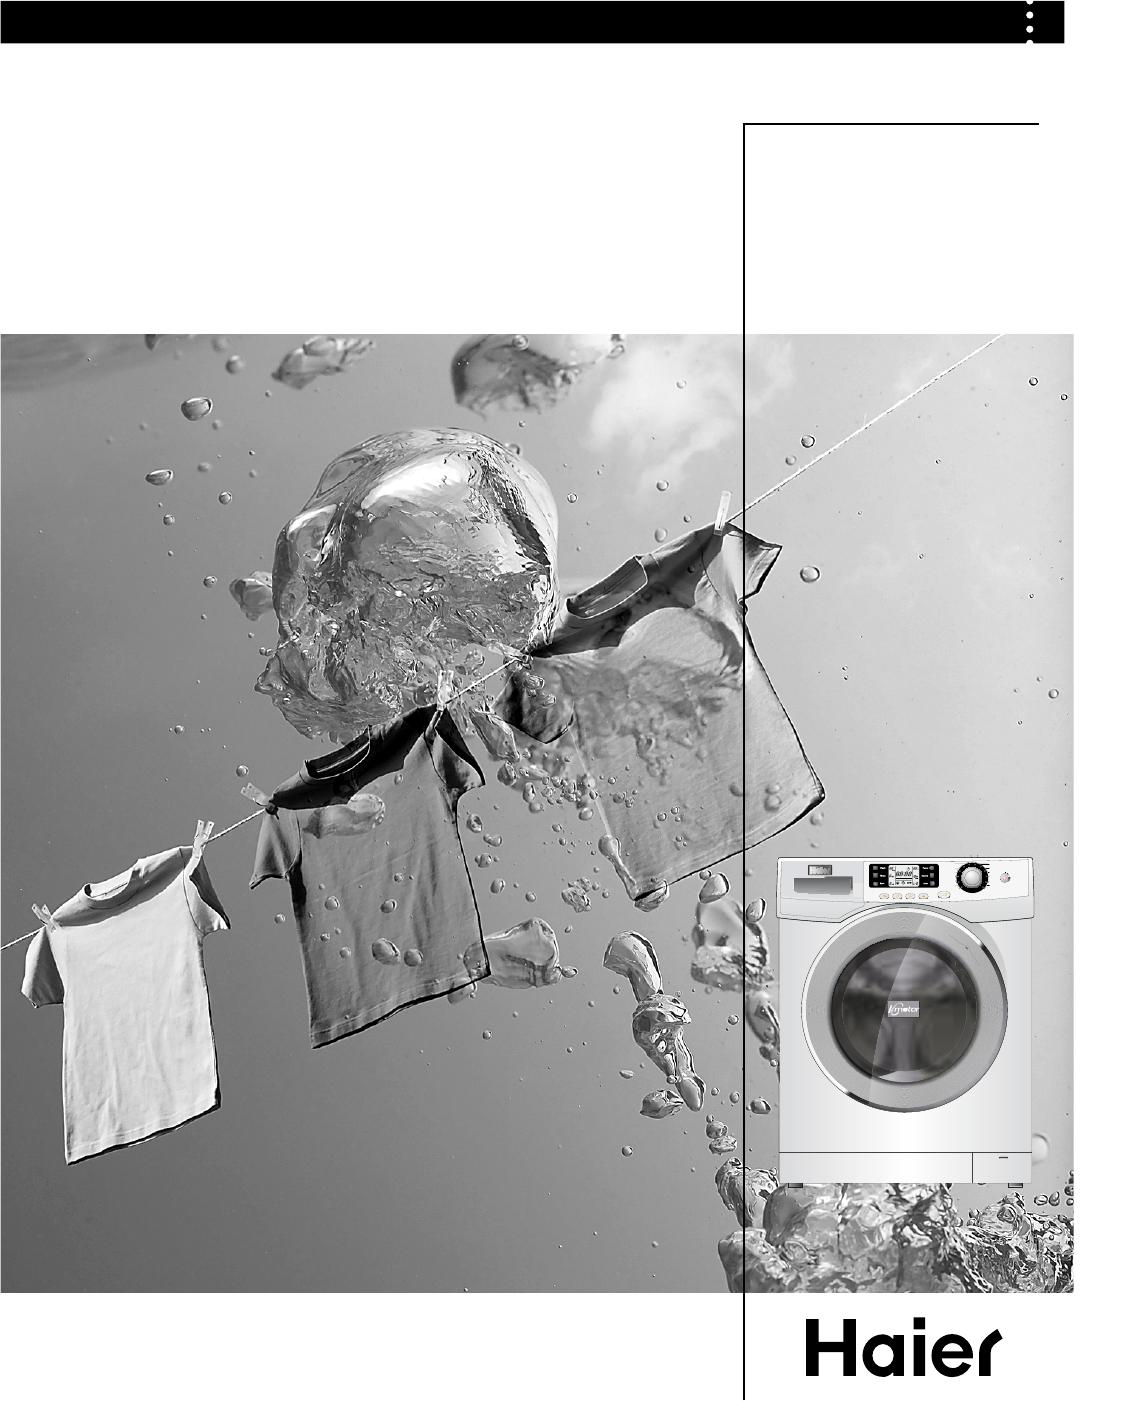 Haier Washer Hw70 B1286 F Users Manual